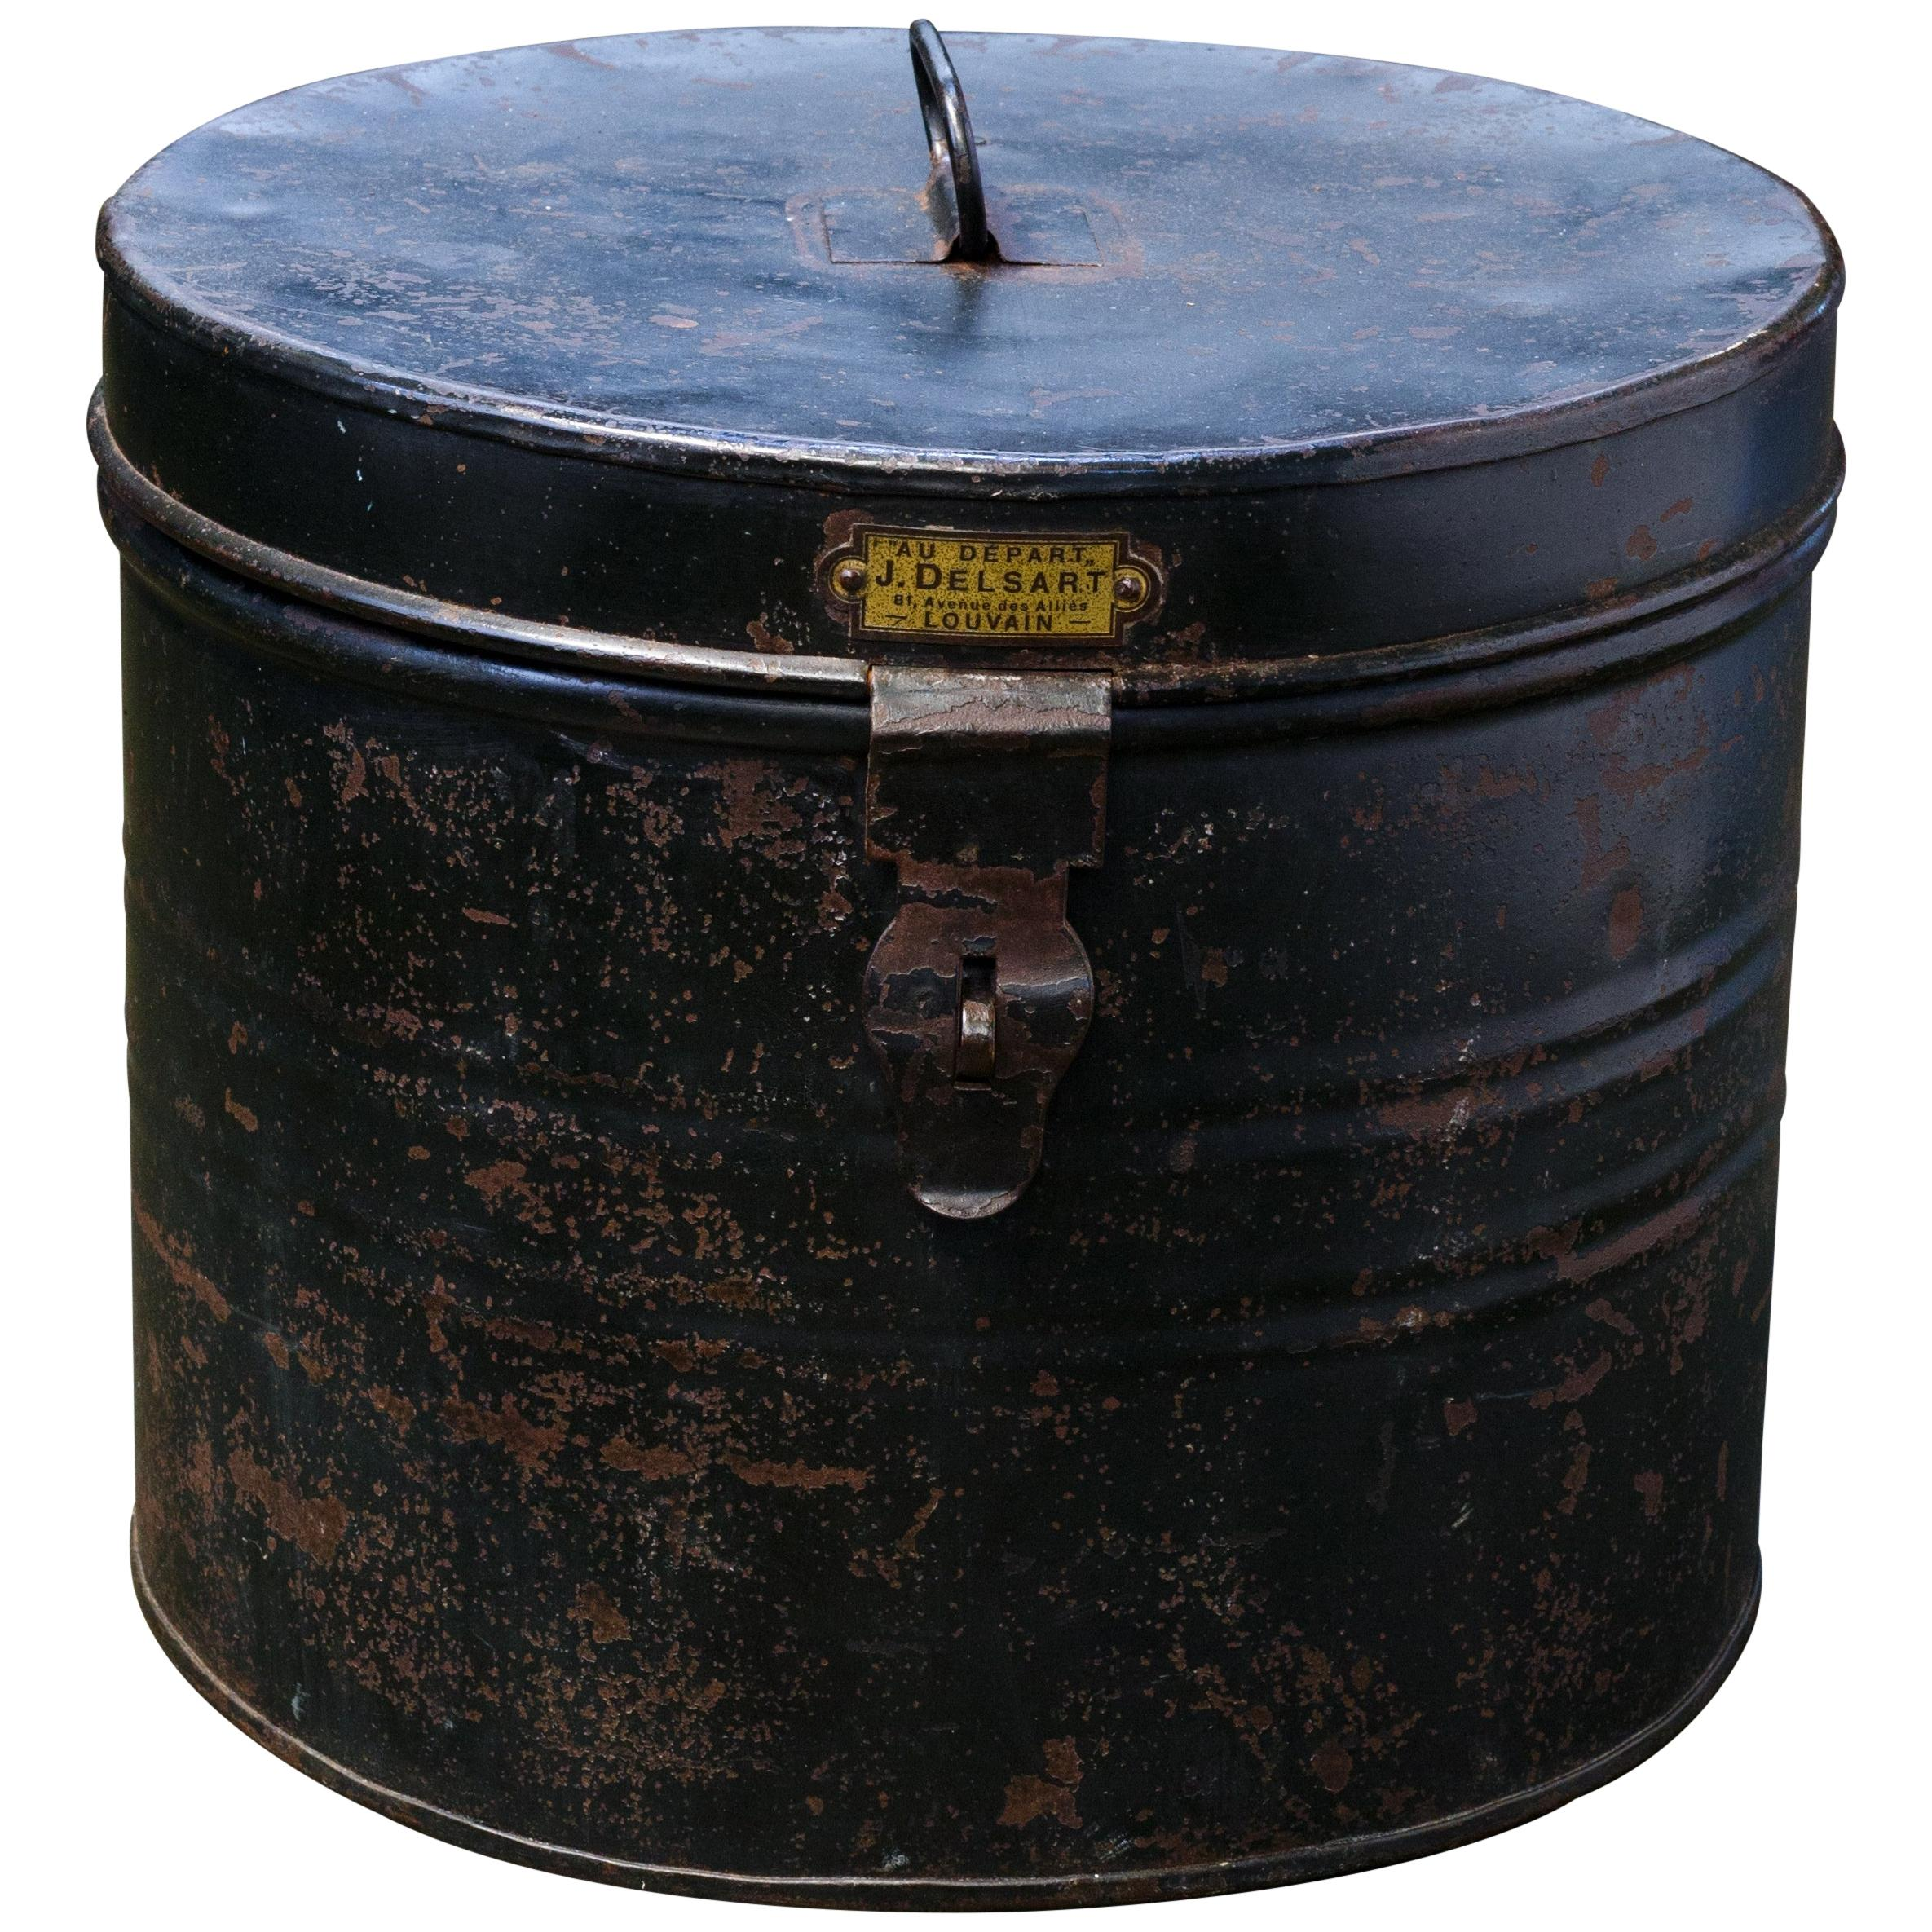 Early 20th Century Lidded Metal Hat Box